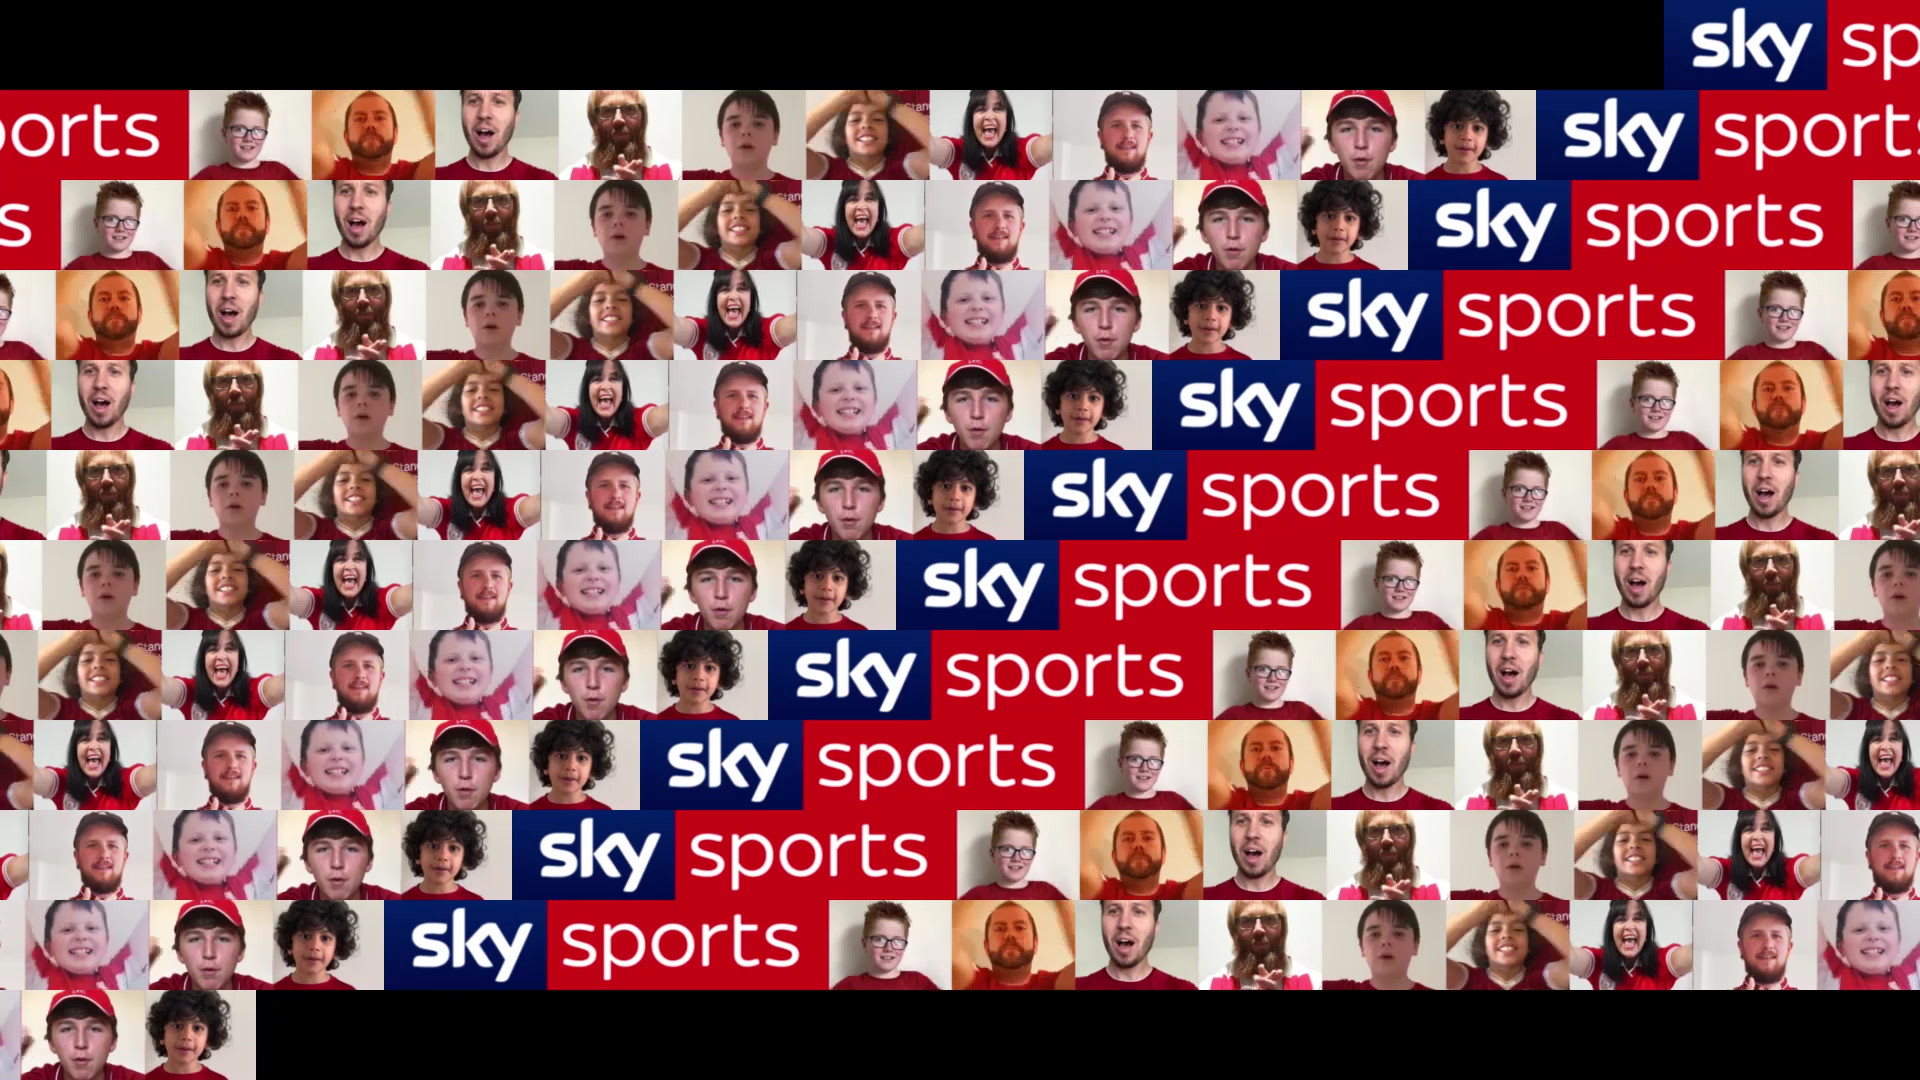 Manchester United big grid